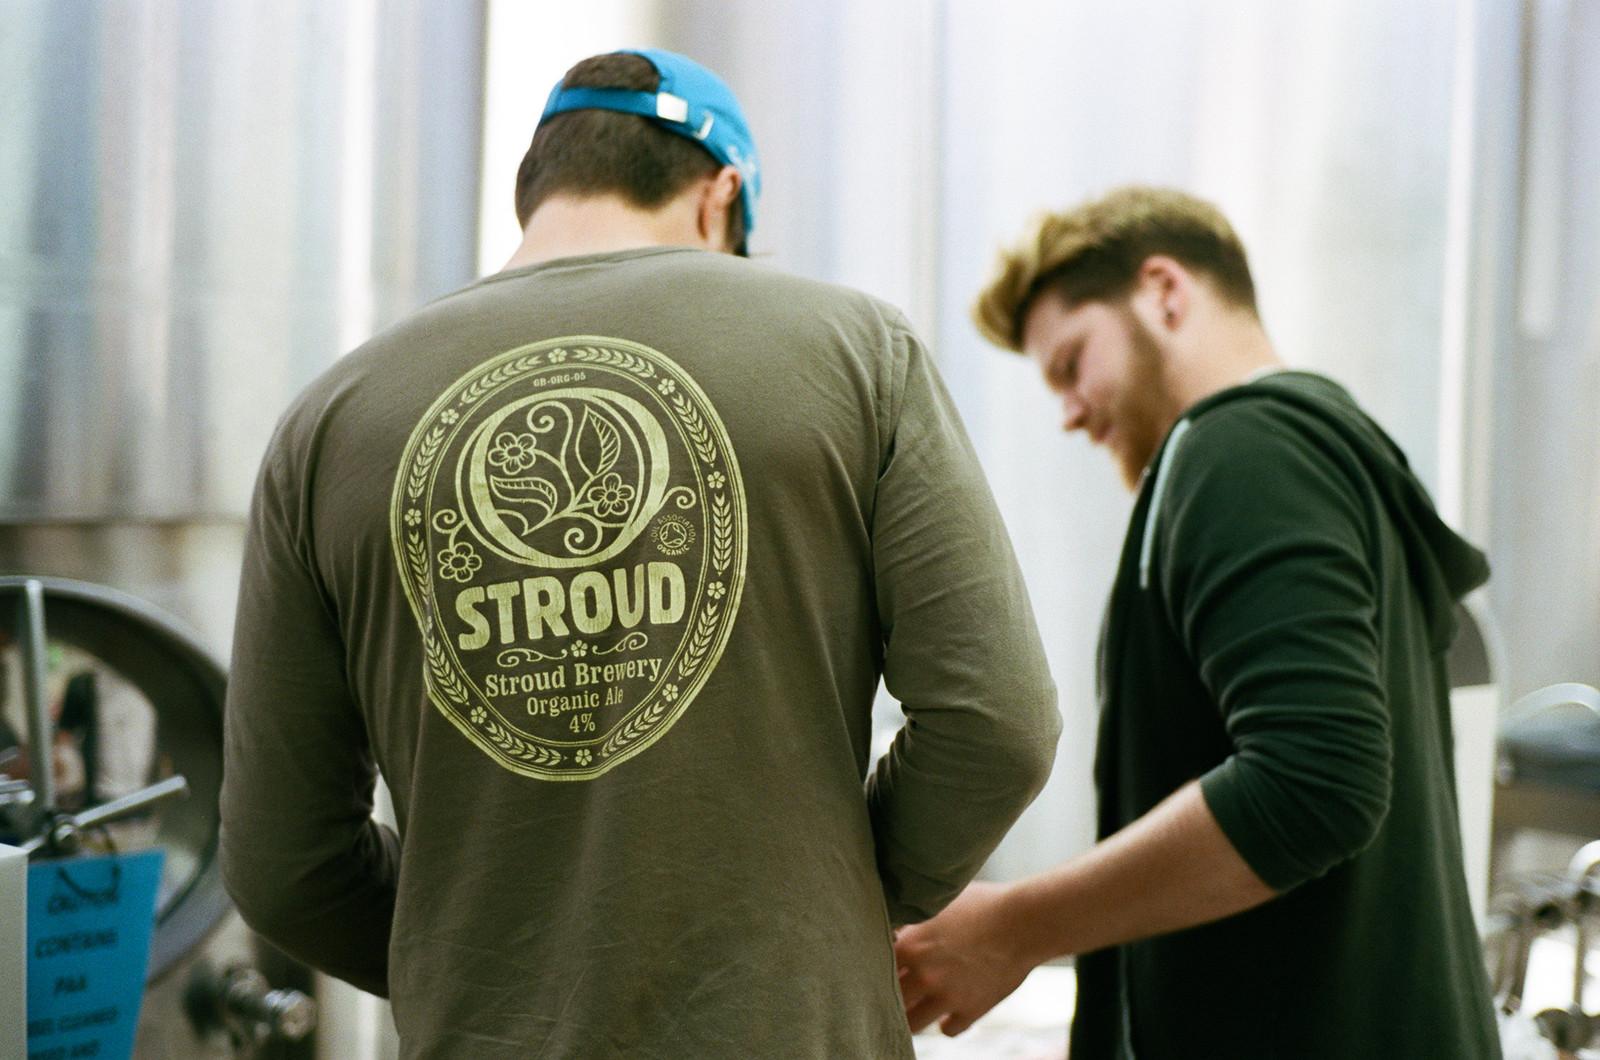 Stroud-brewery-4